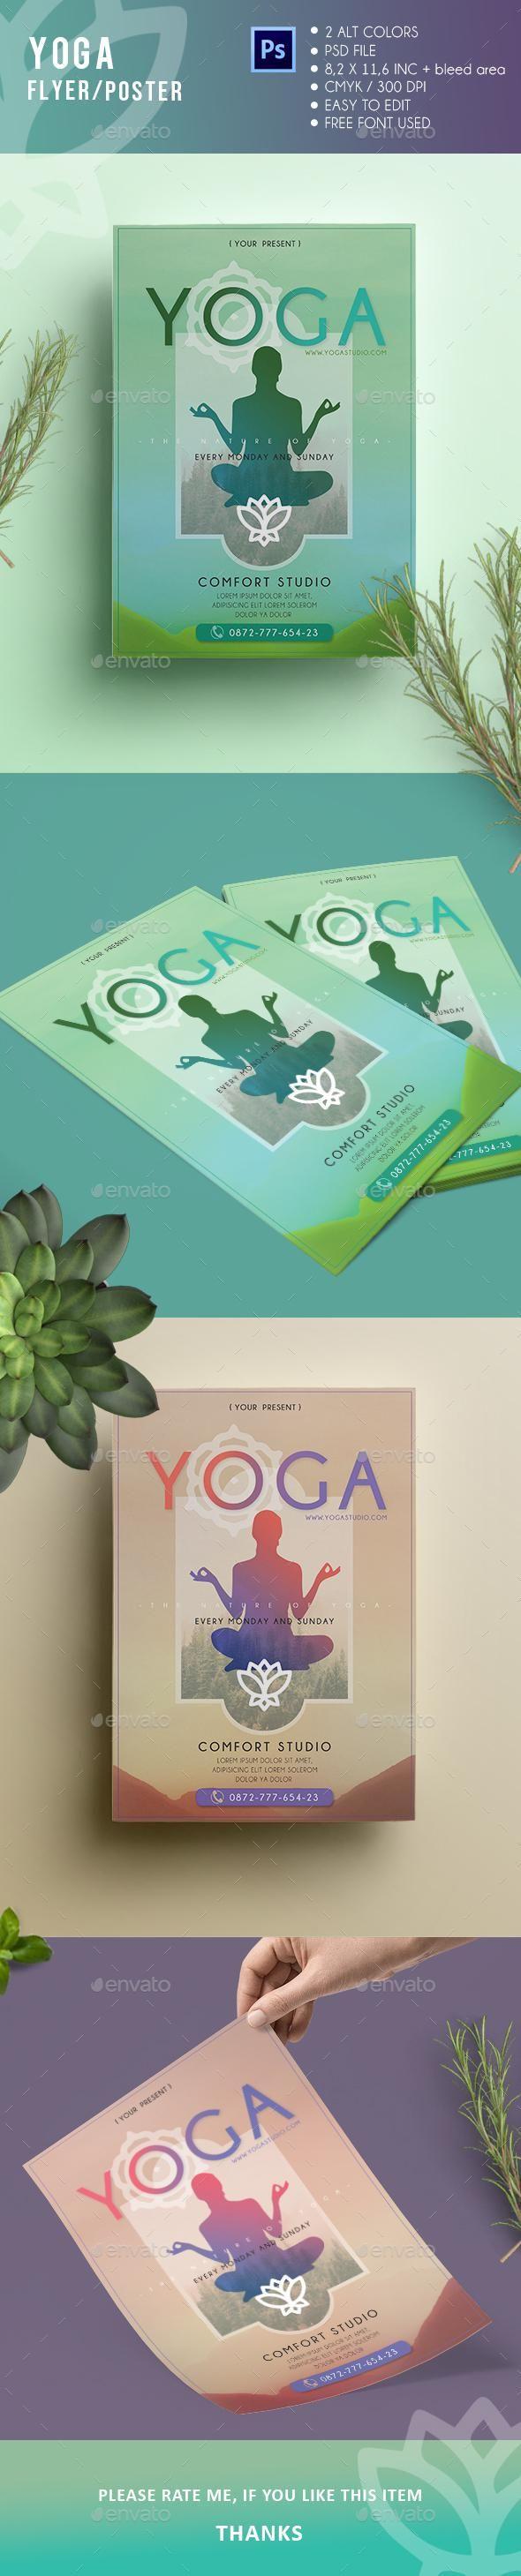 71 besten Yoga flyer Bilder auf Pinterest | Yoga logo, Visitenkarten ...